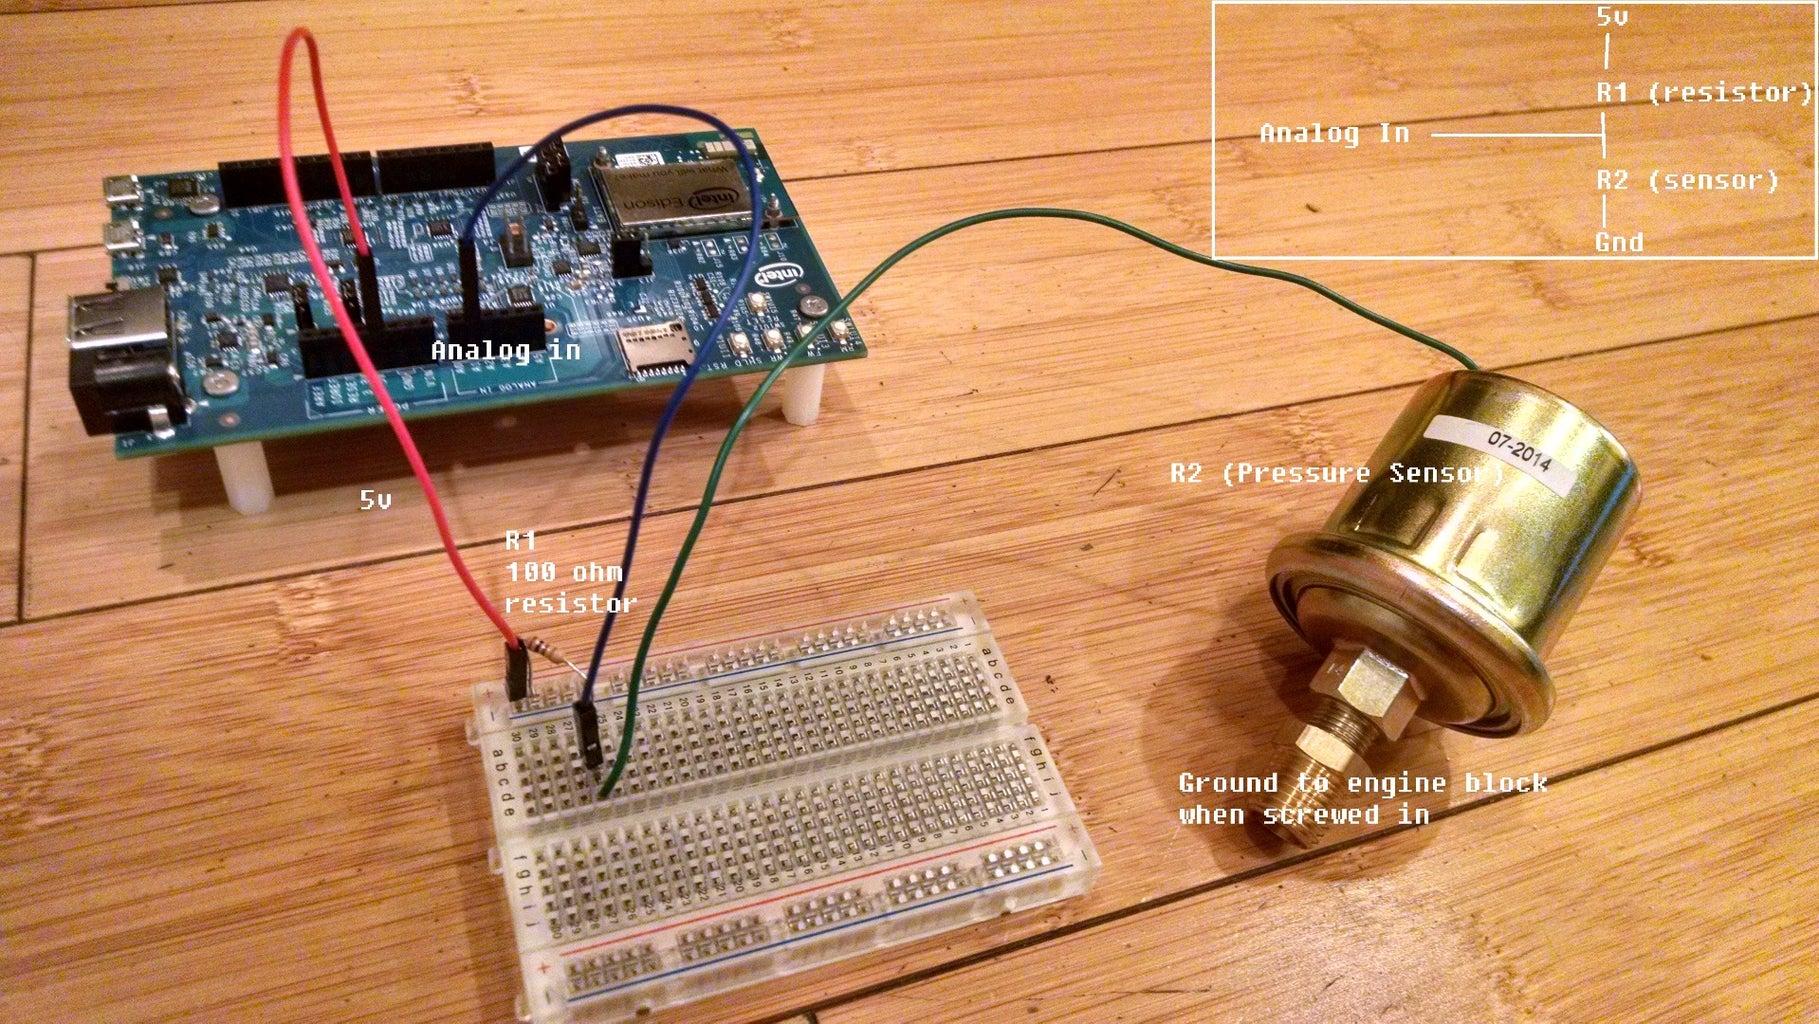 Off the Shelf Sensors (Oil Temperature and Oil Pressure)